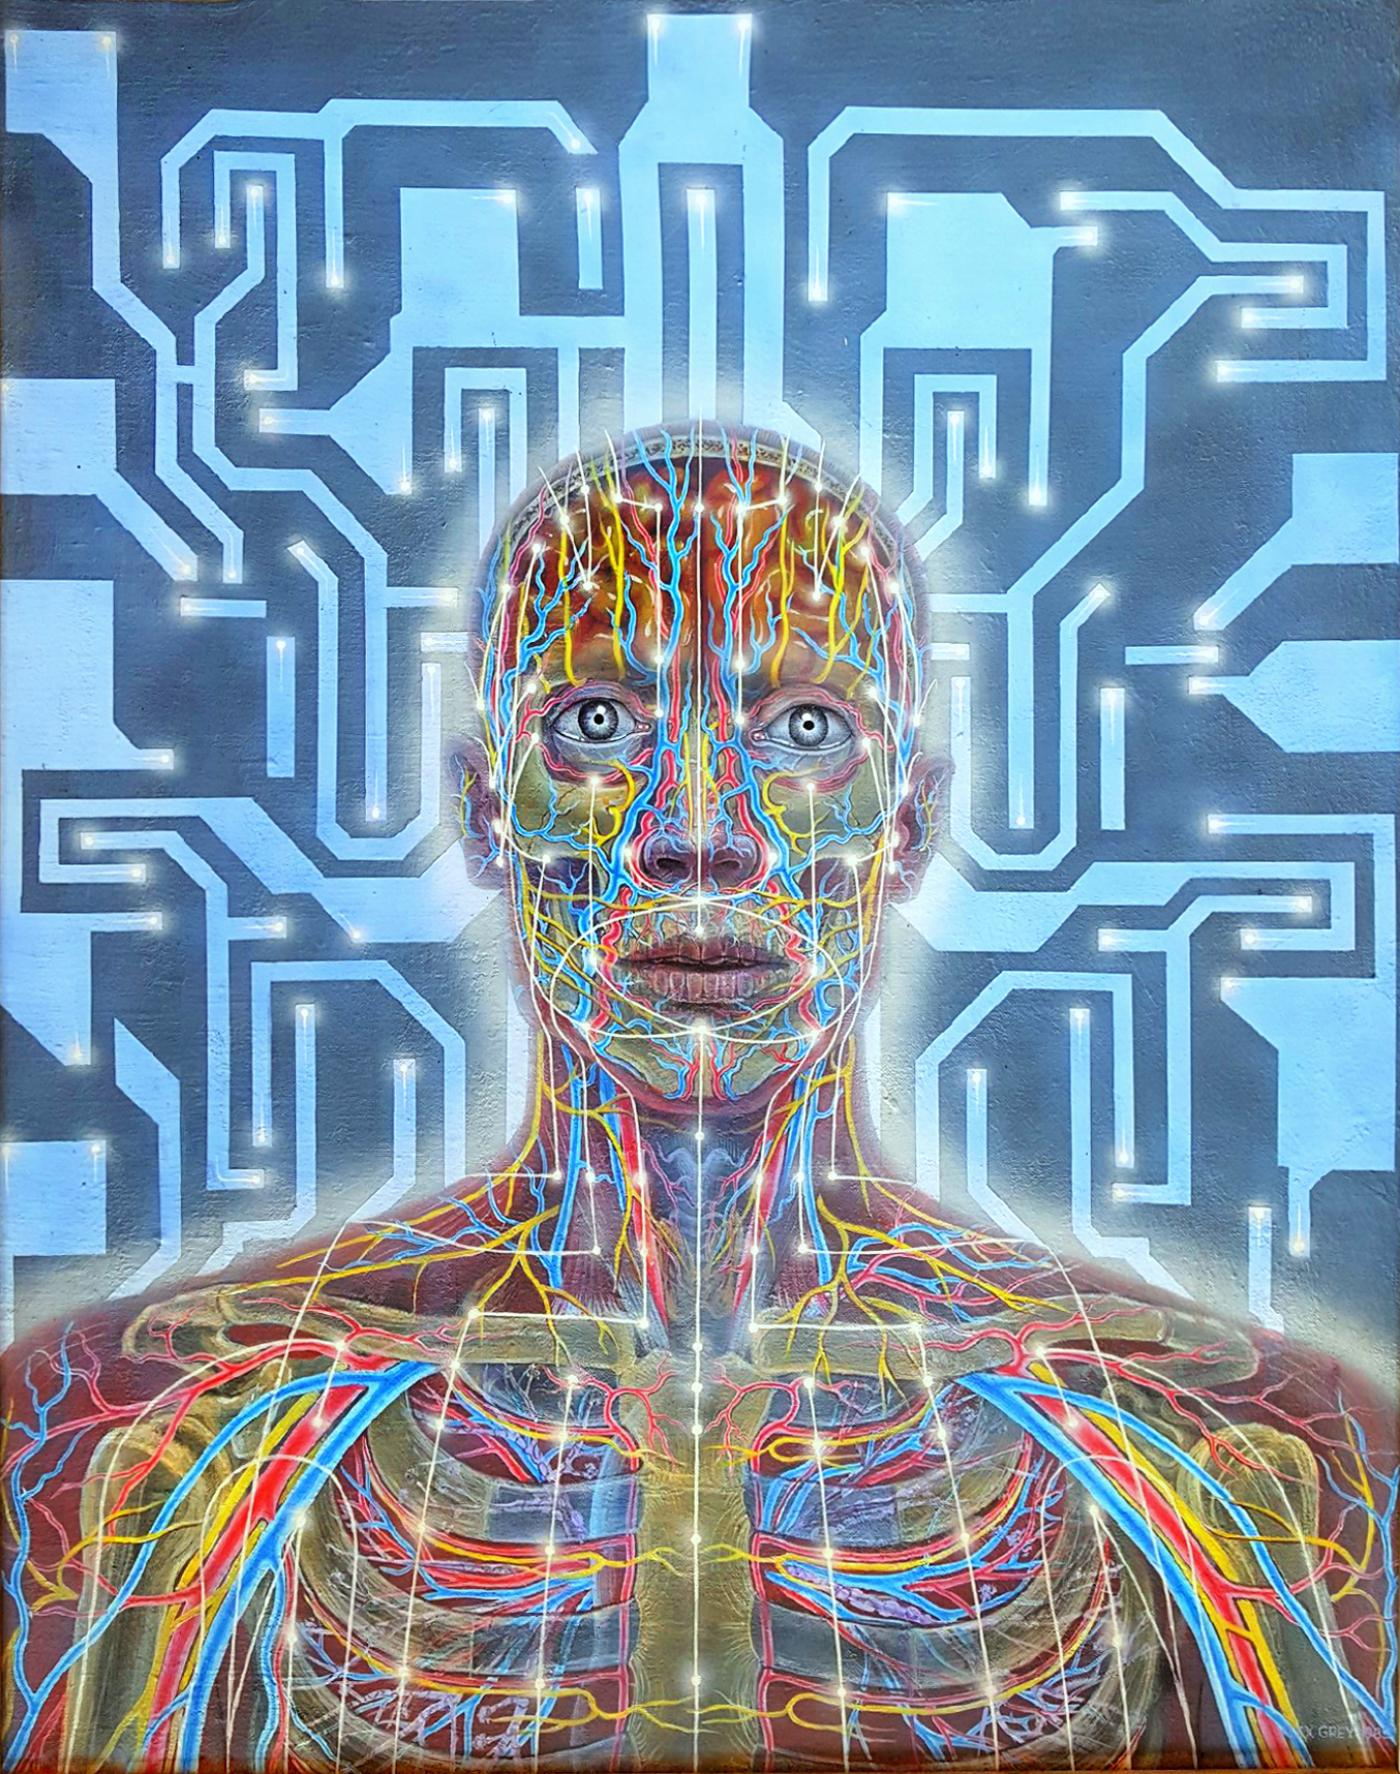 Alex-Grey-Body-Mind-and-Spirit-204855-398803.jpg